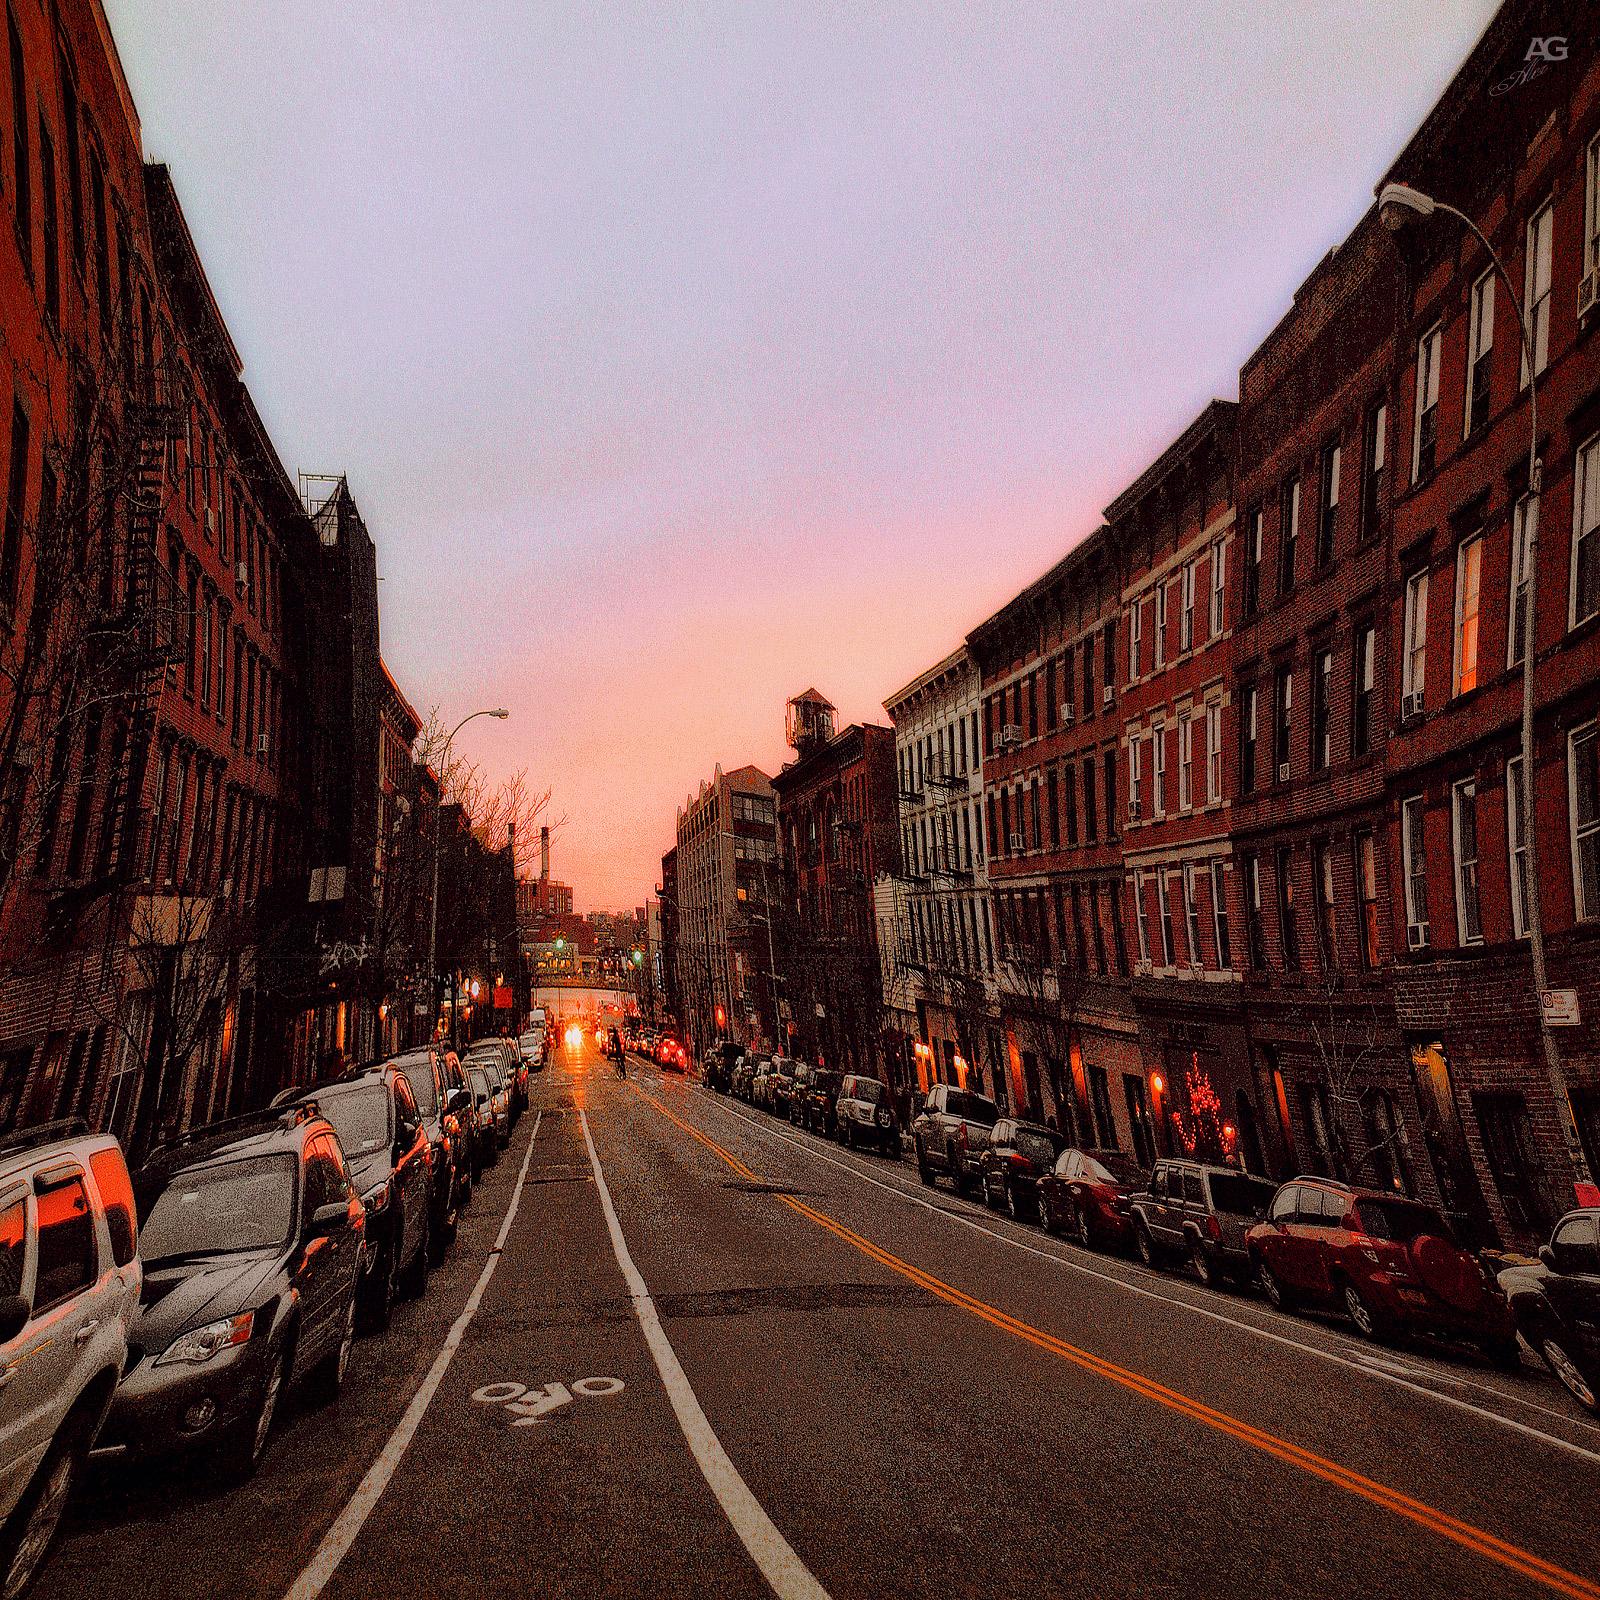 SunsetStreetInGreenPoint_warped_1600